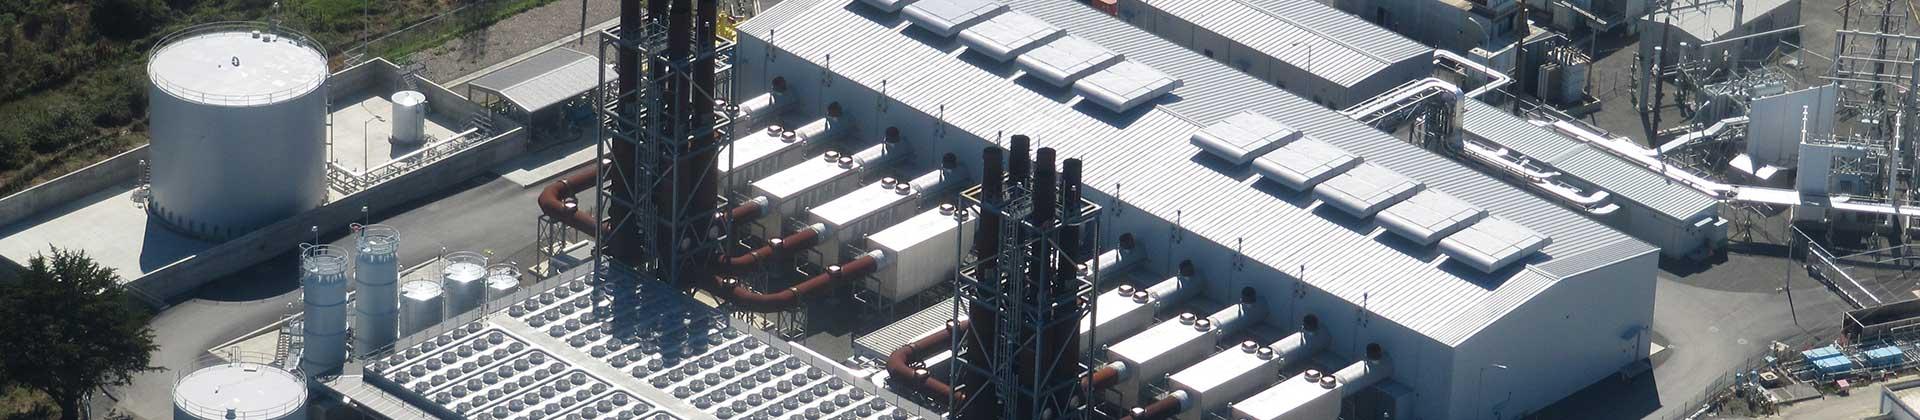 Humboldt Bay Generating Station